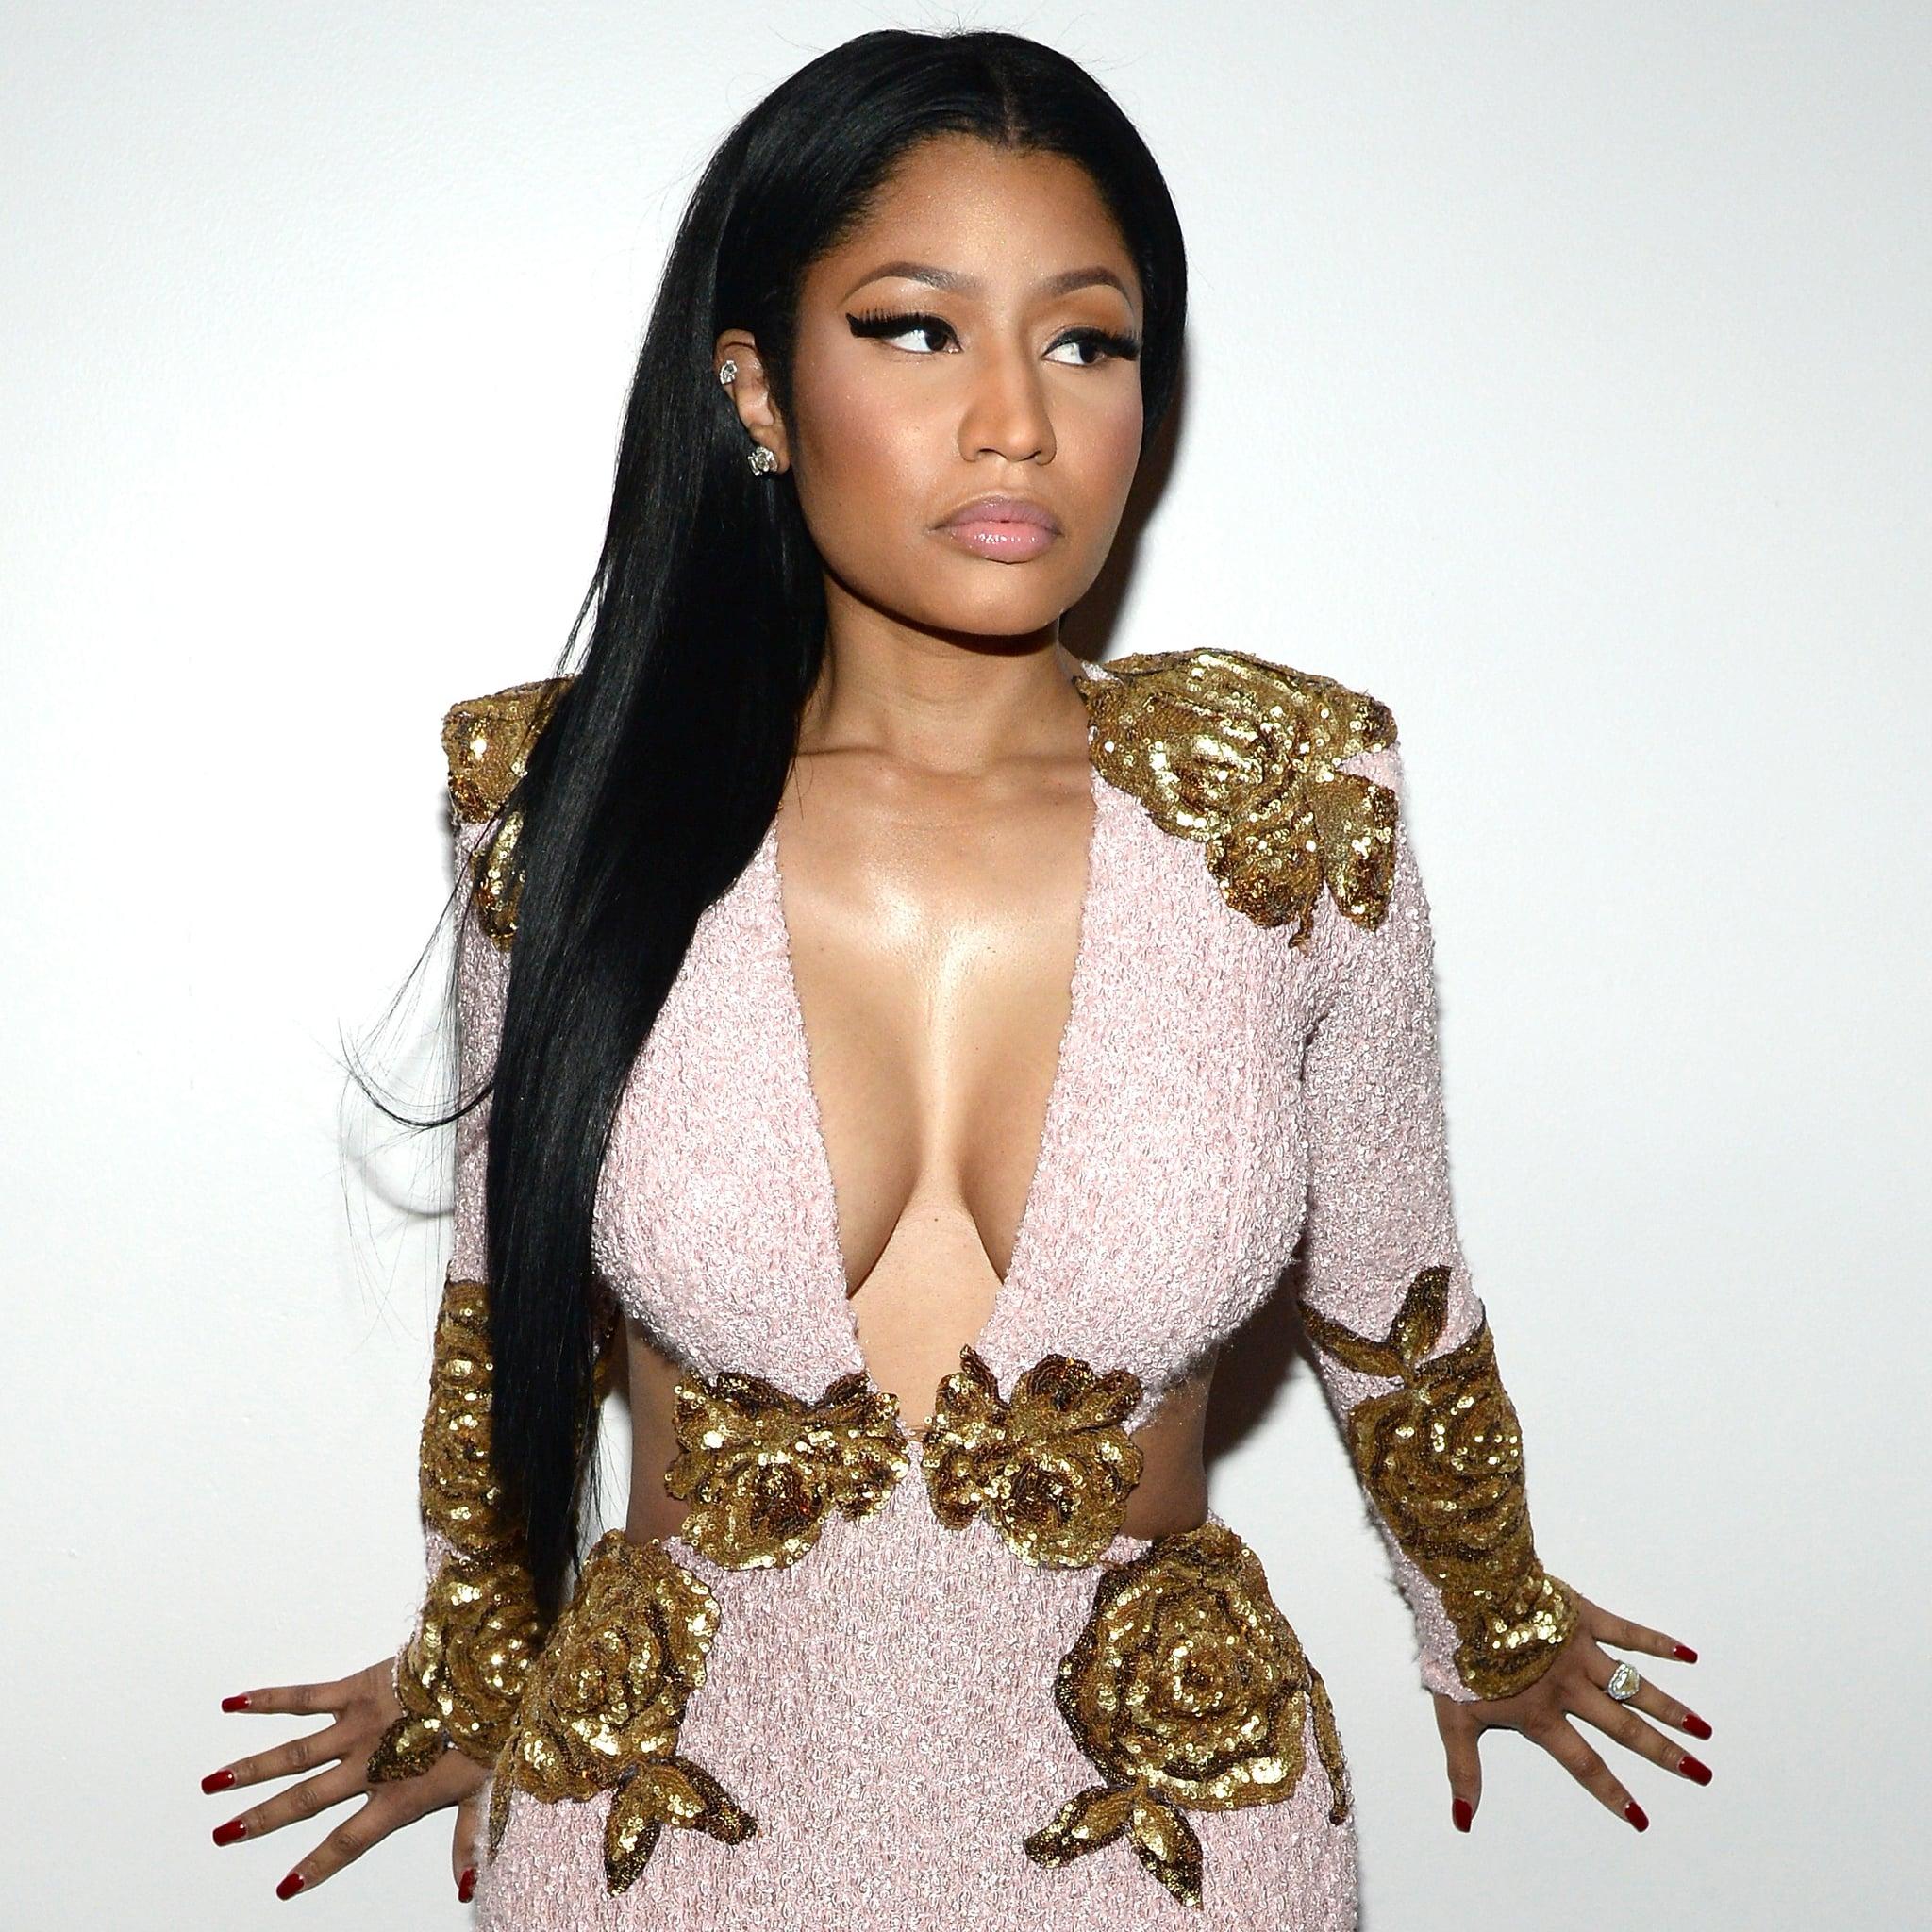 Nicki Minaj Drake et Lil Wayne parlent de sexe dans ''Only